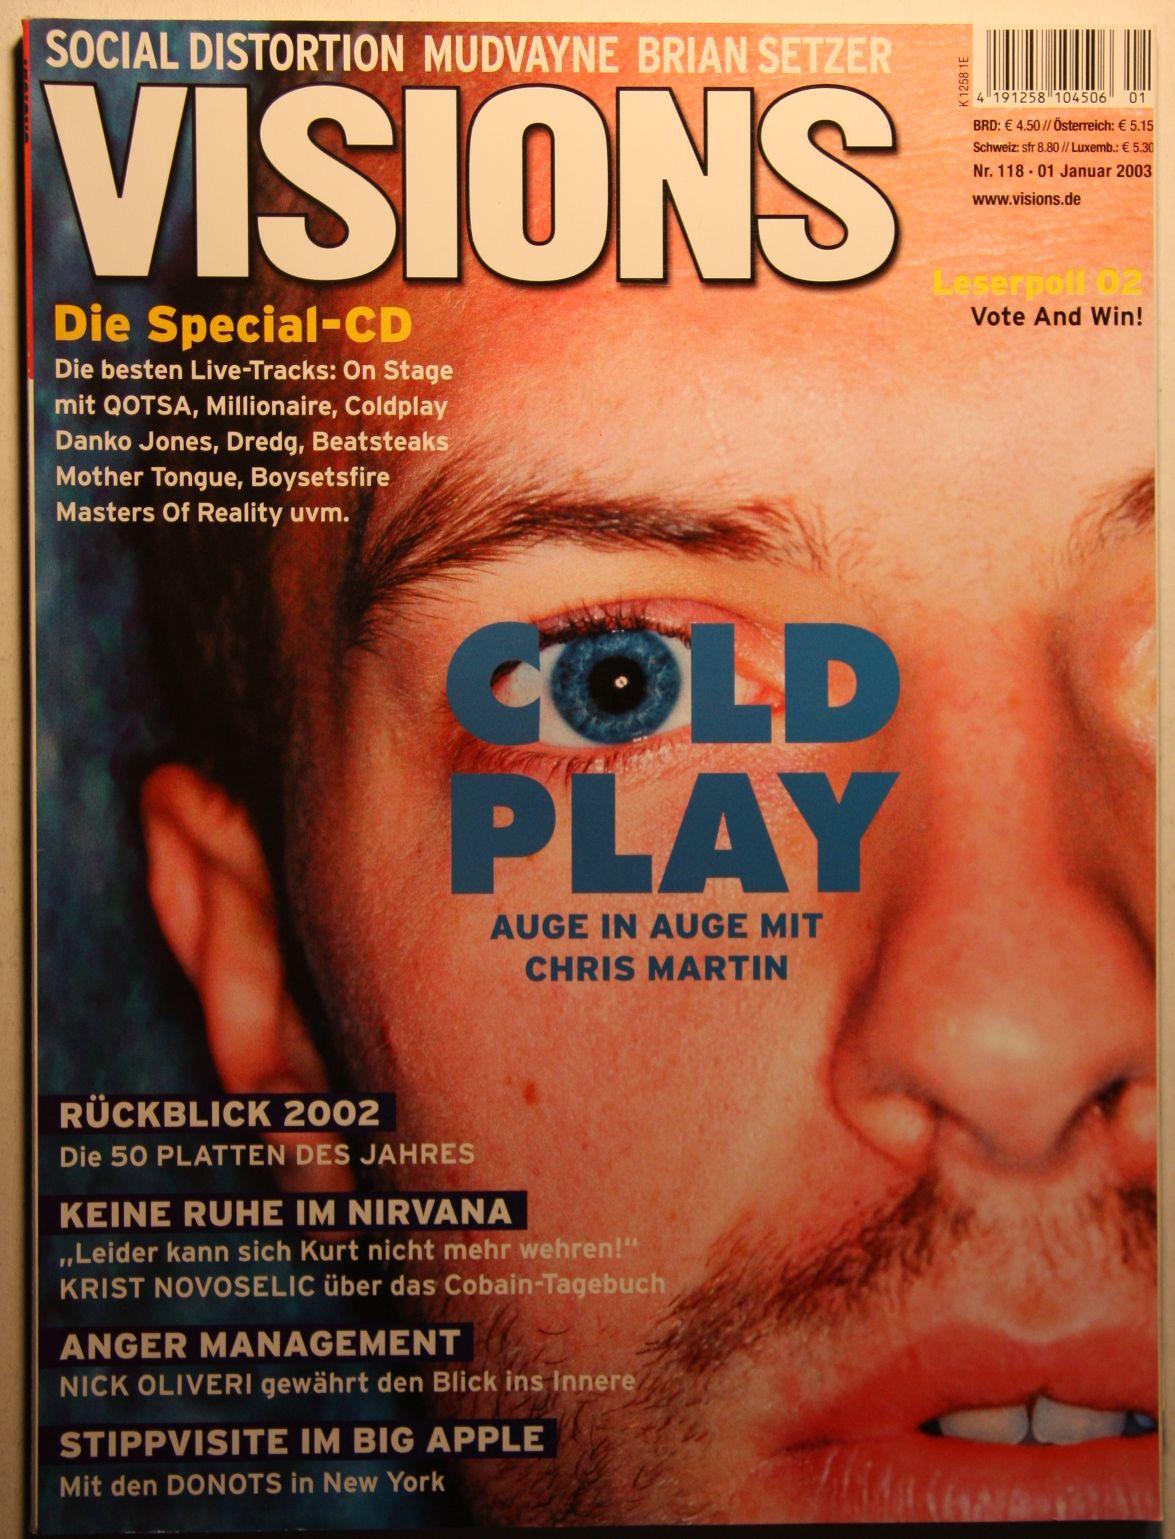 German Visions Magazine Nr118 Jan 03